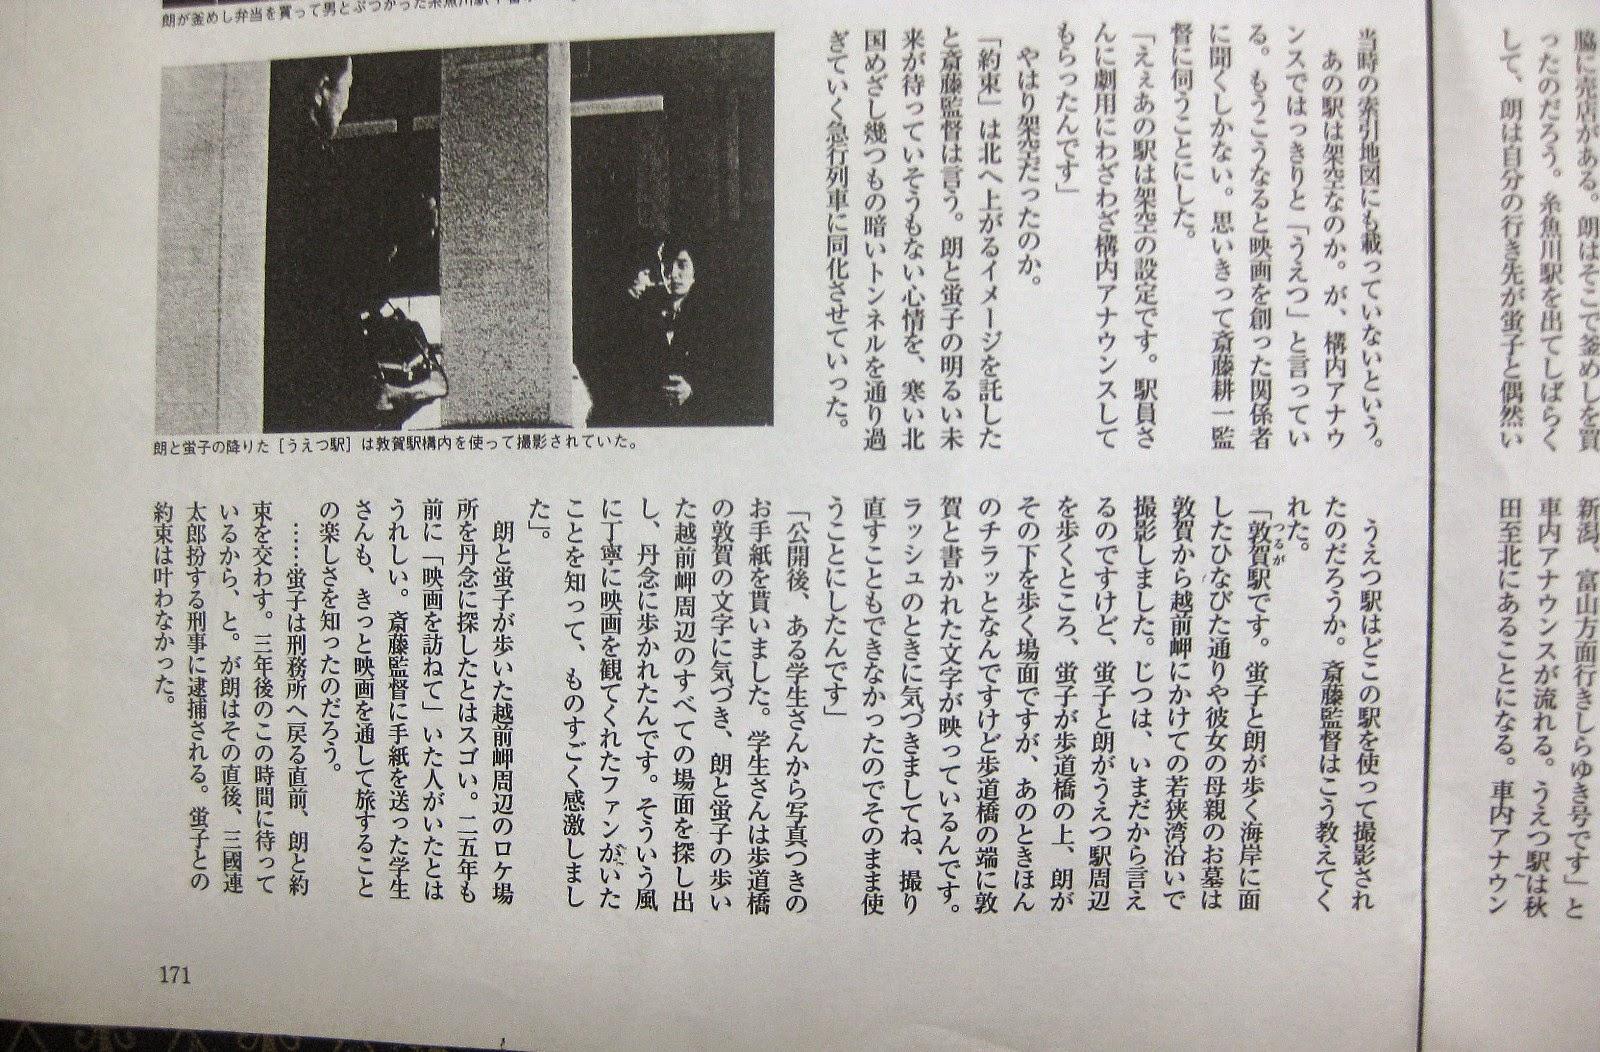 Photo: 『約束』(1972)  http://inagara.octsky.net/yakusoku-1972 キネマ旬報1997年8月下旬号での映画評論家・田沼雄一氏の映画評 この中で「学生」とあるのは赤松さんのこと